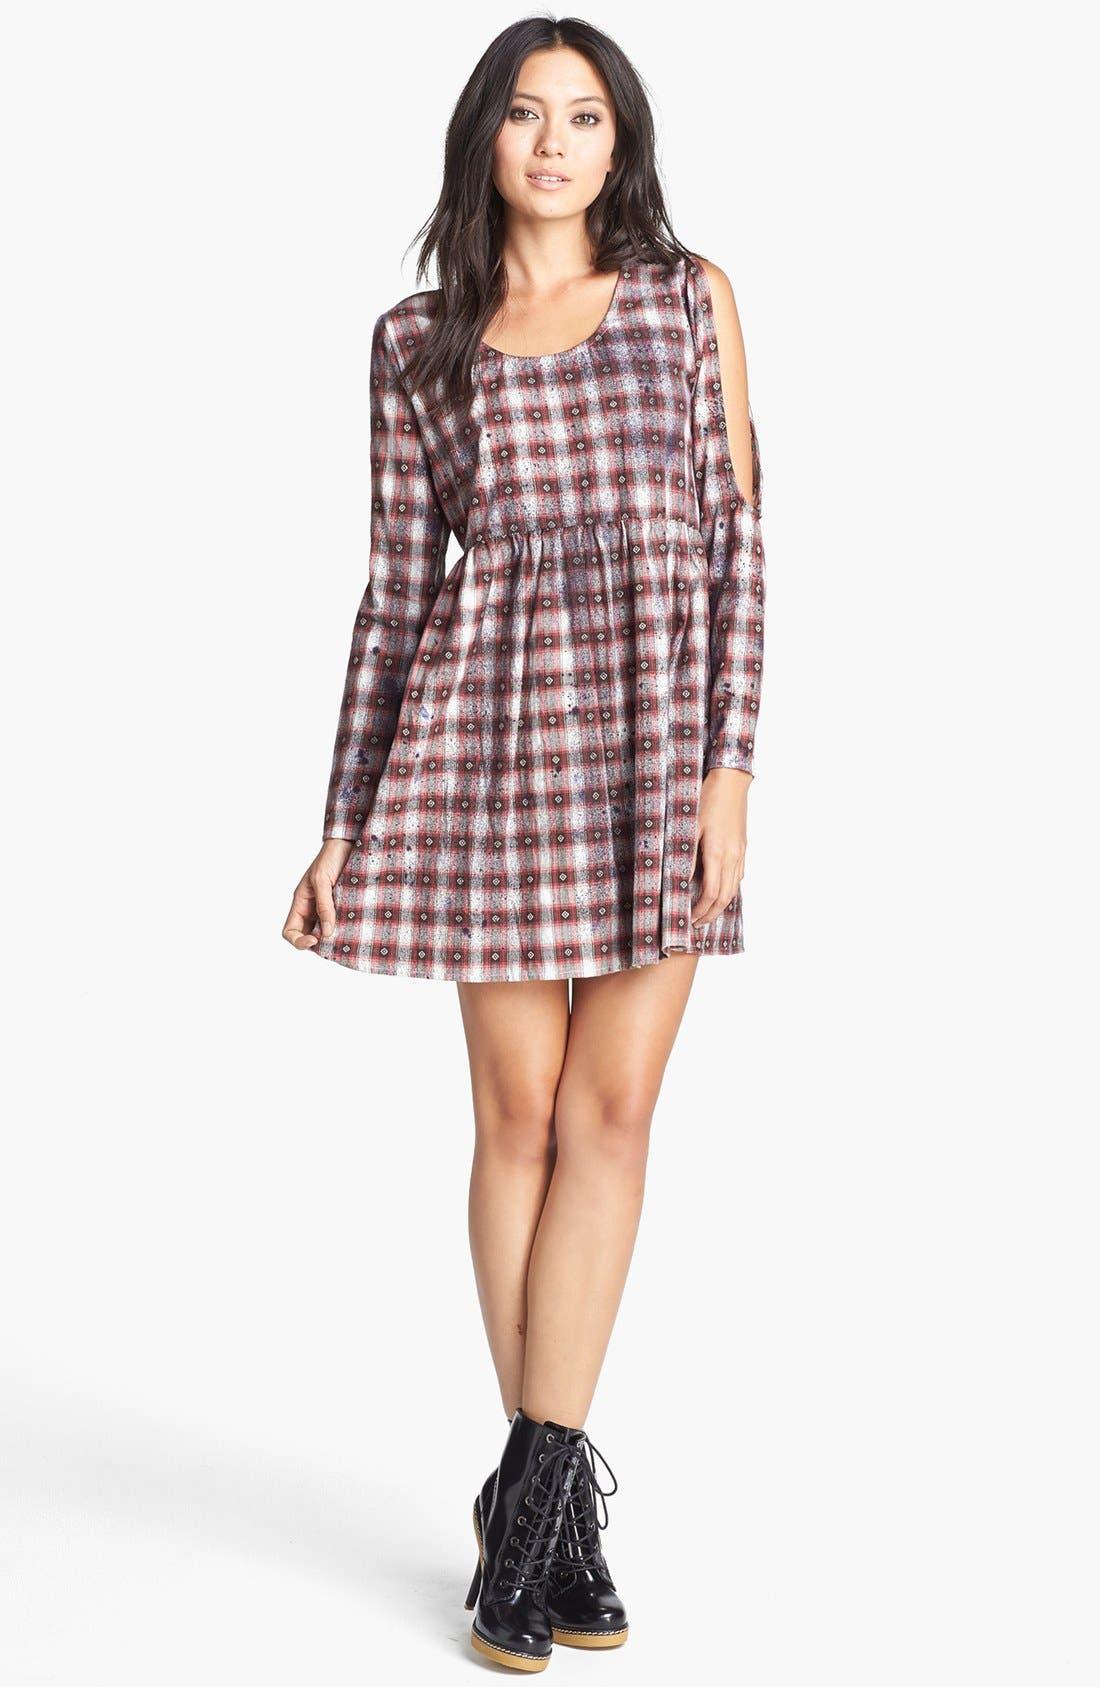 Main Image - MINKPINK 'Easy Going' Print Babydoll Dress